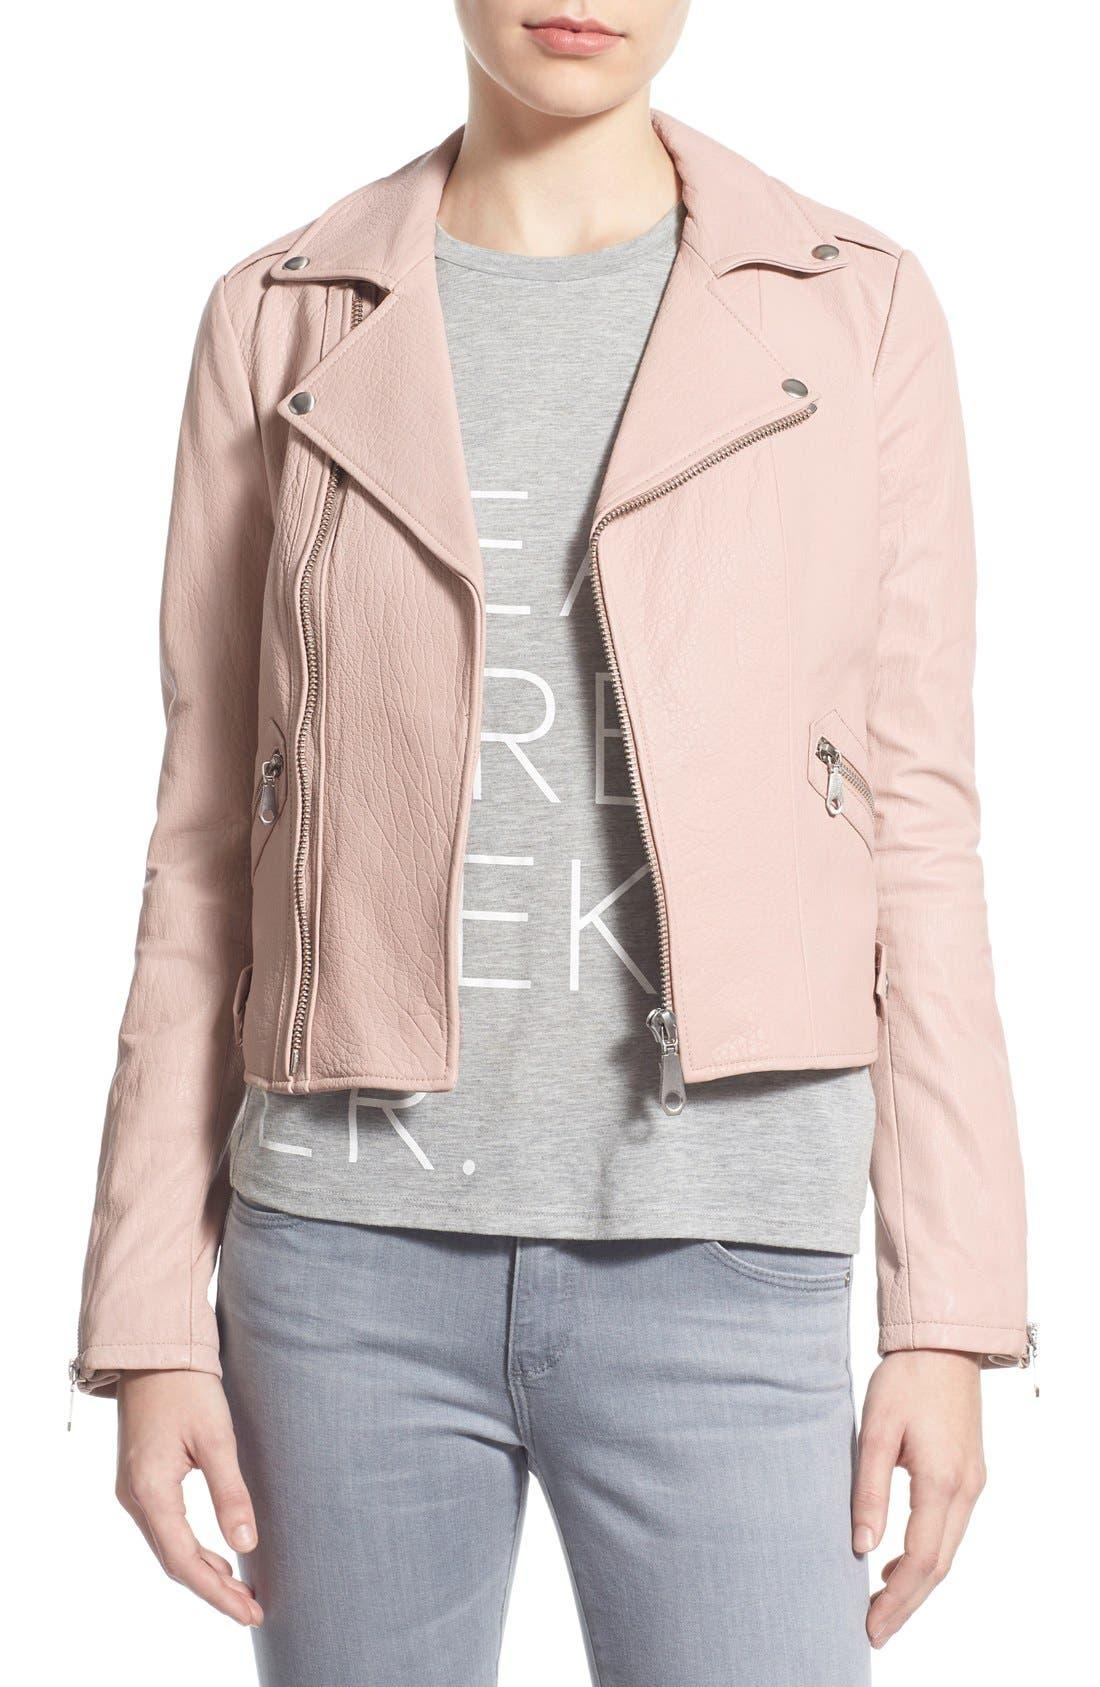 Alternate Image 1 Selected - Rebecca Minkoff Pebble Leather Jacket